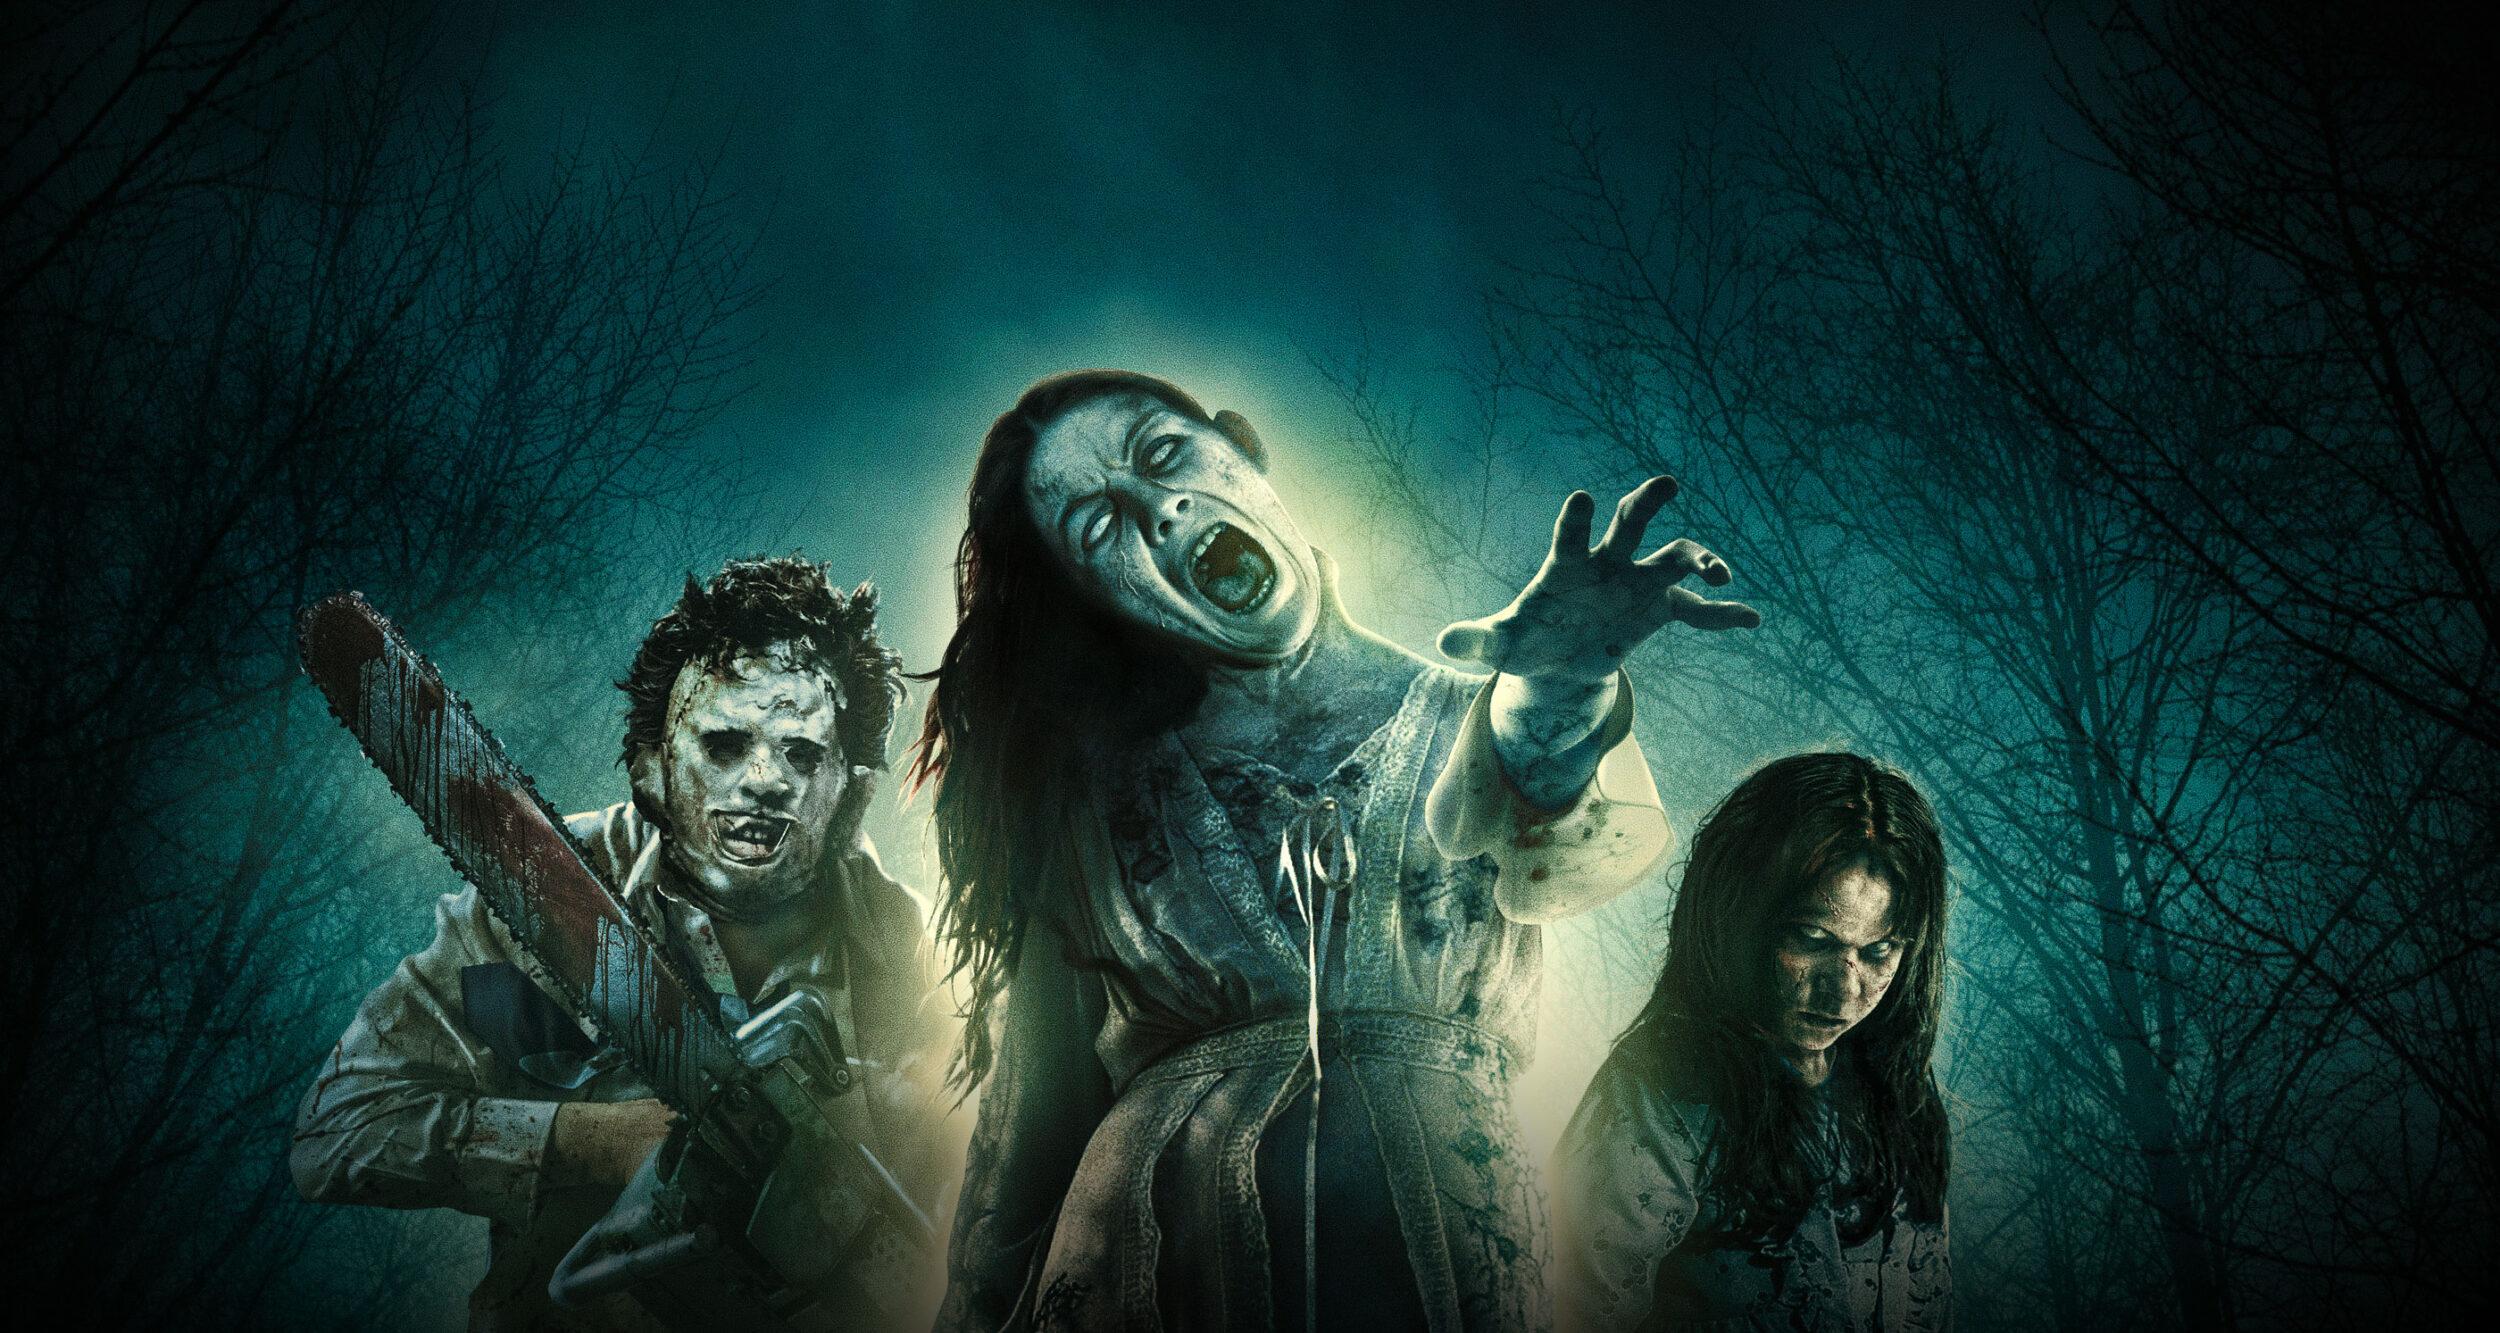 Universal Studios Hollywood apunto de develar 'Halloween Horror Nights'